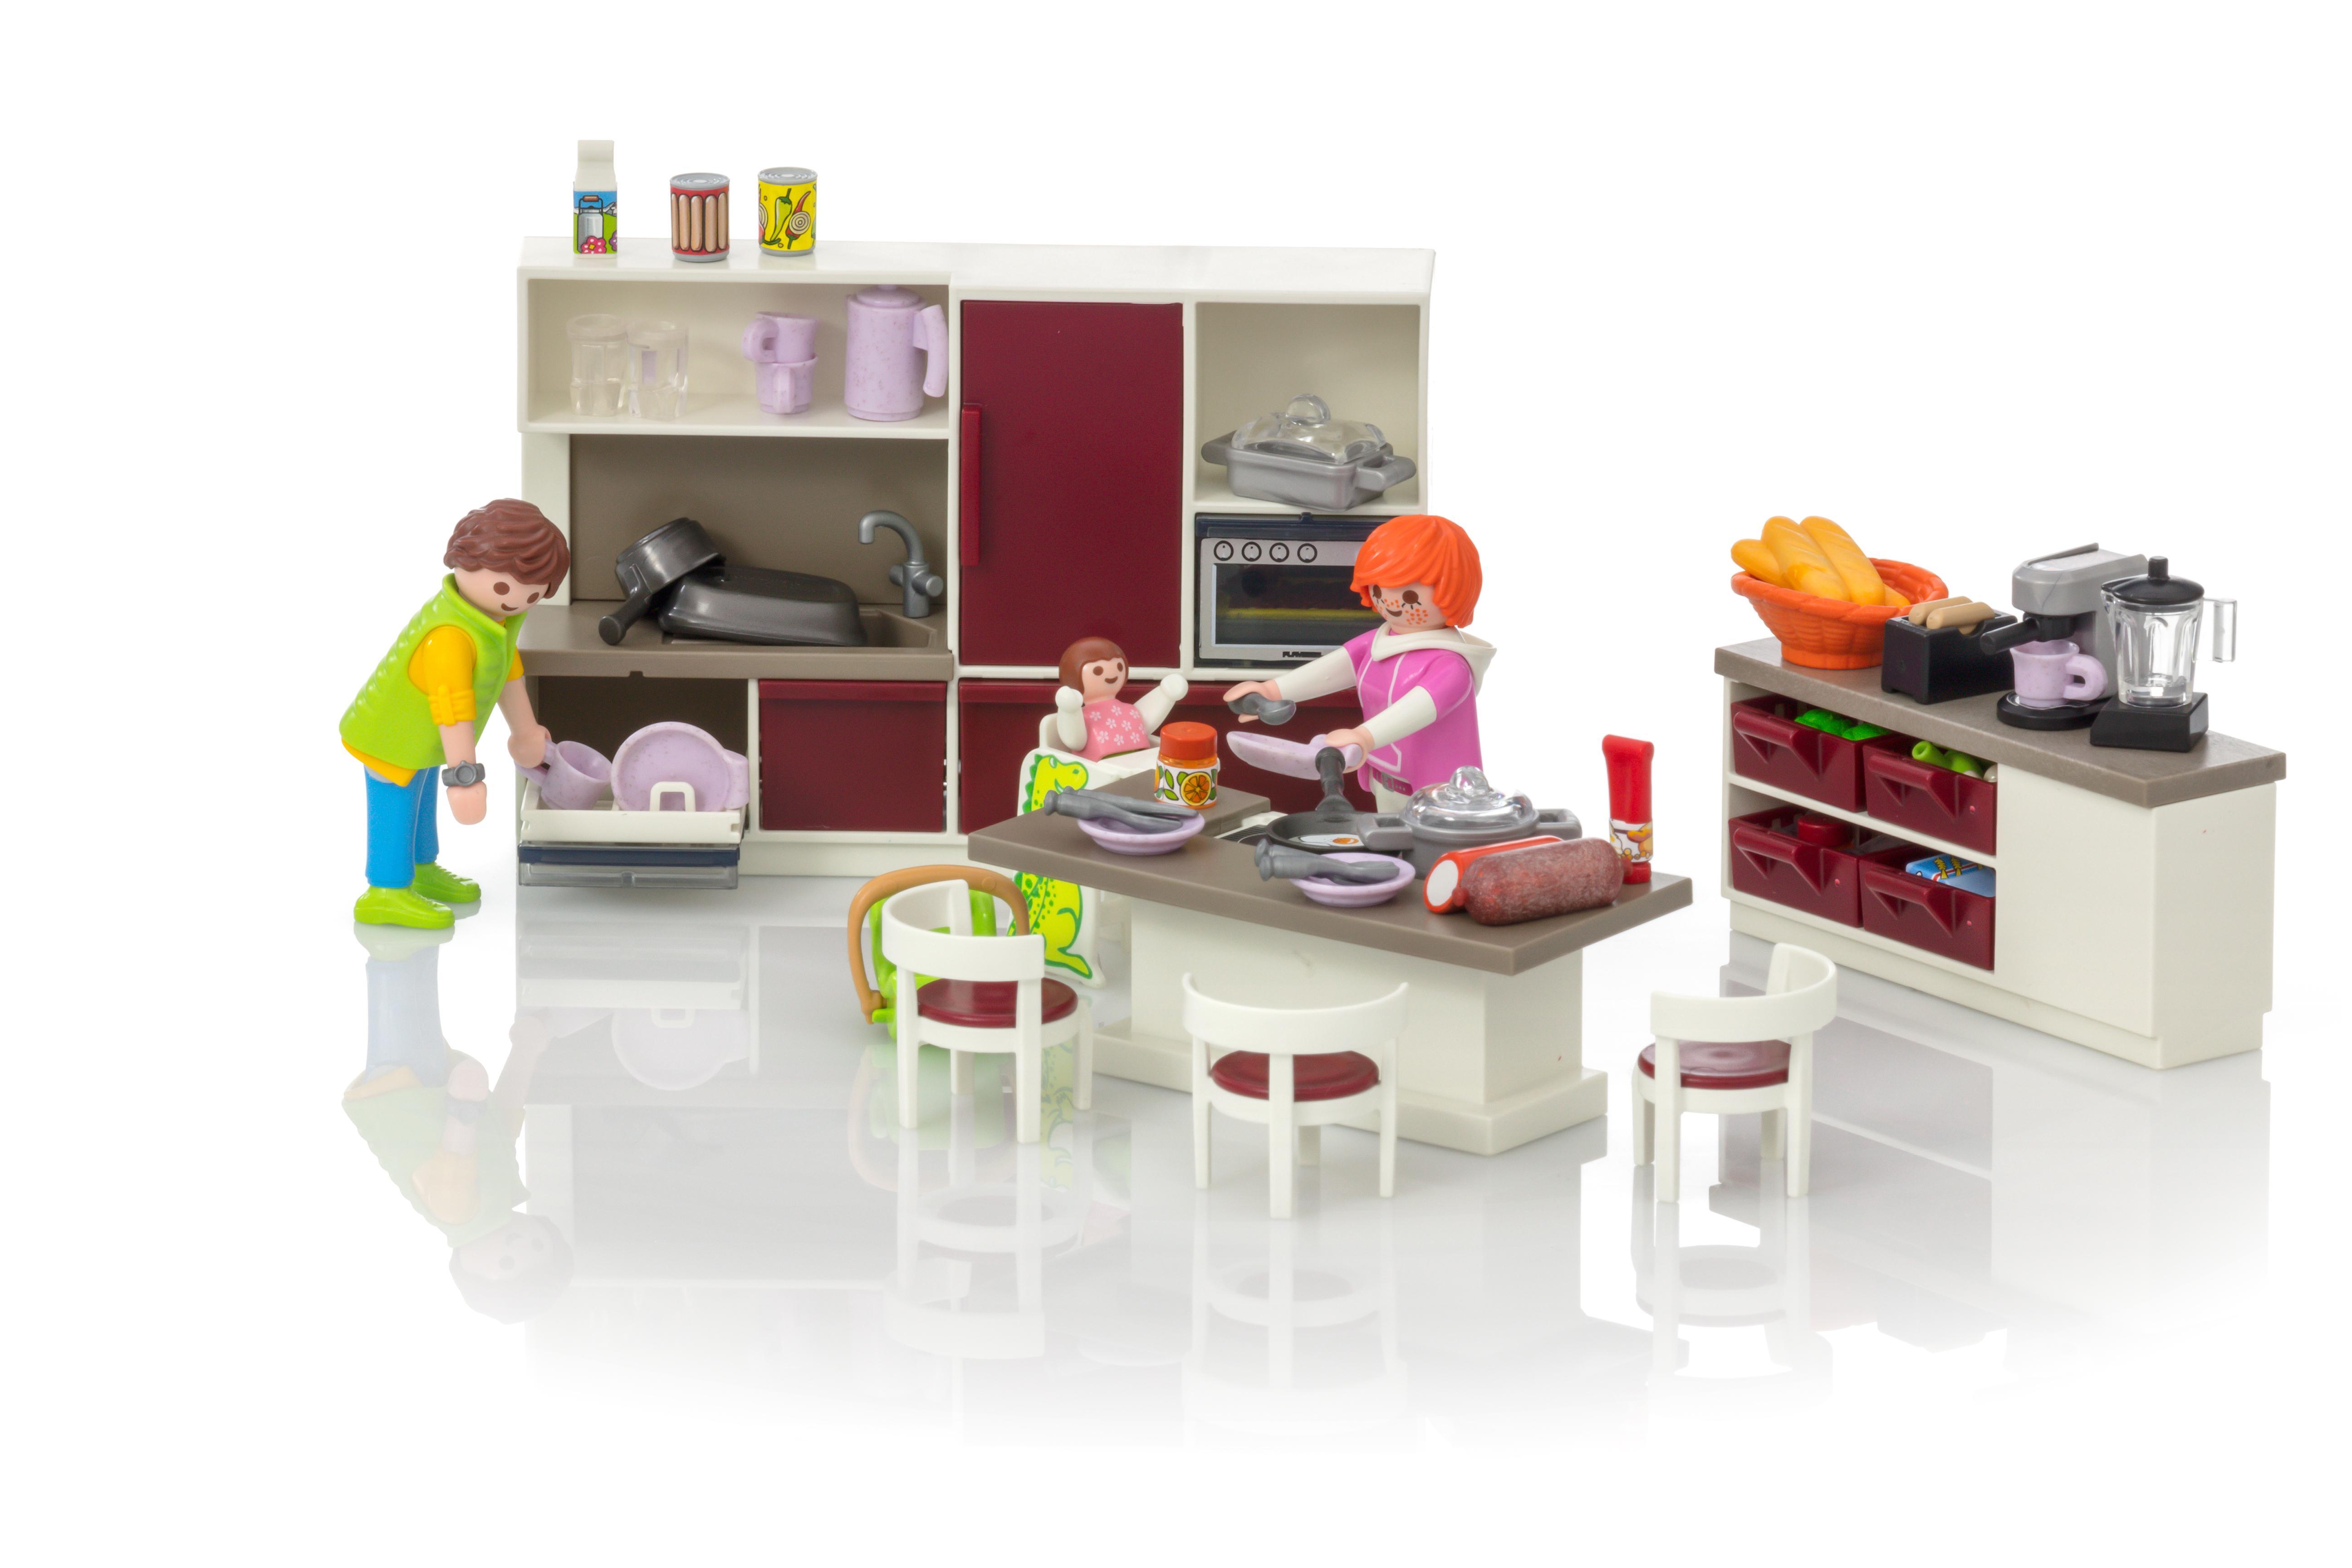 Playmobil Keuken 9269 : Leefkeuken playmobil nederland